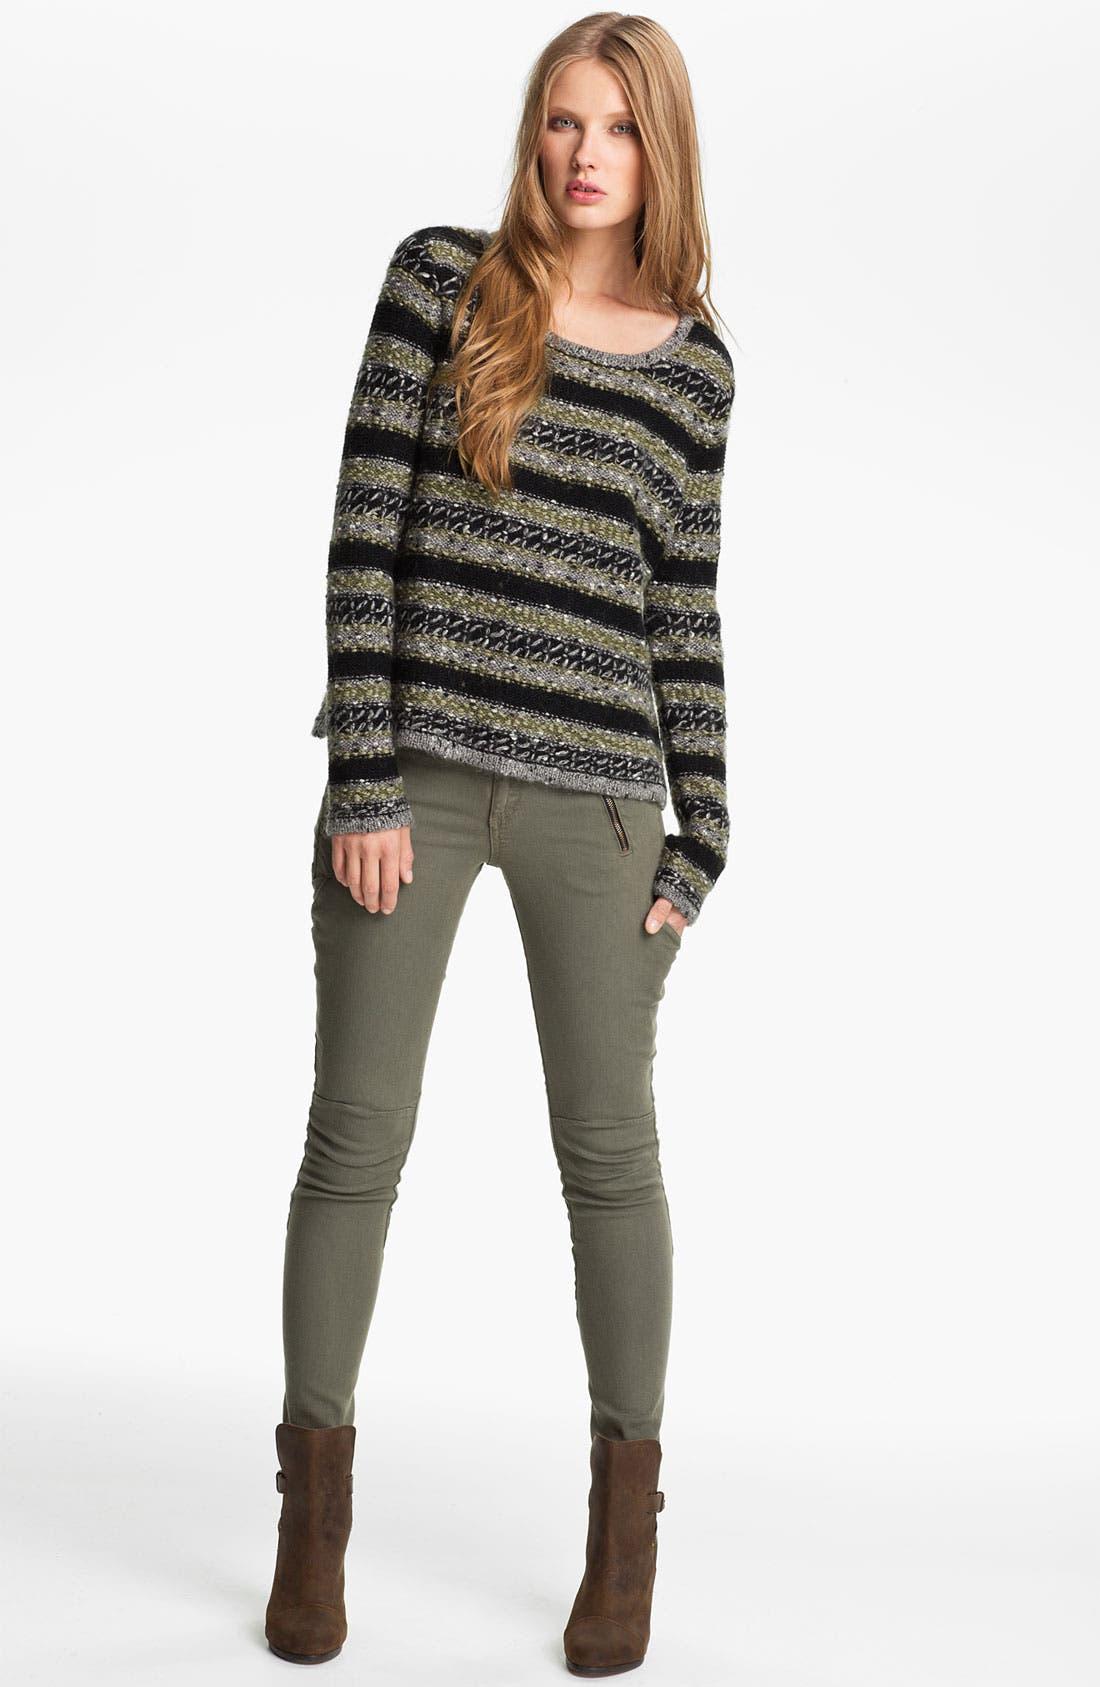 Alternate Image 1 Selected - rag & bone 'Palermo' Pullover